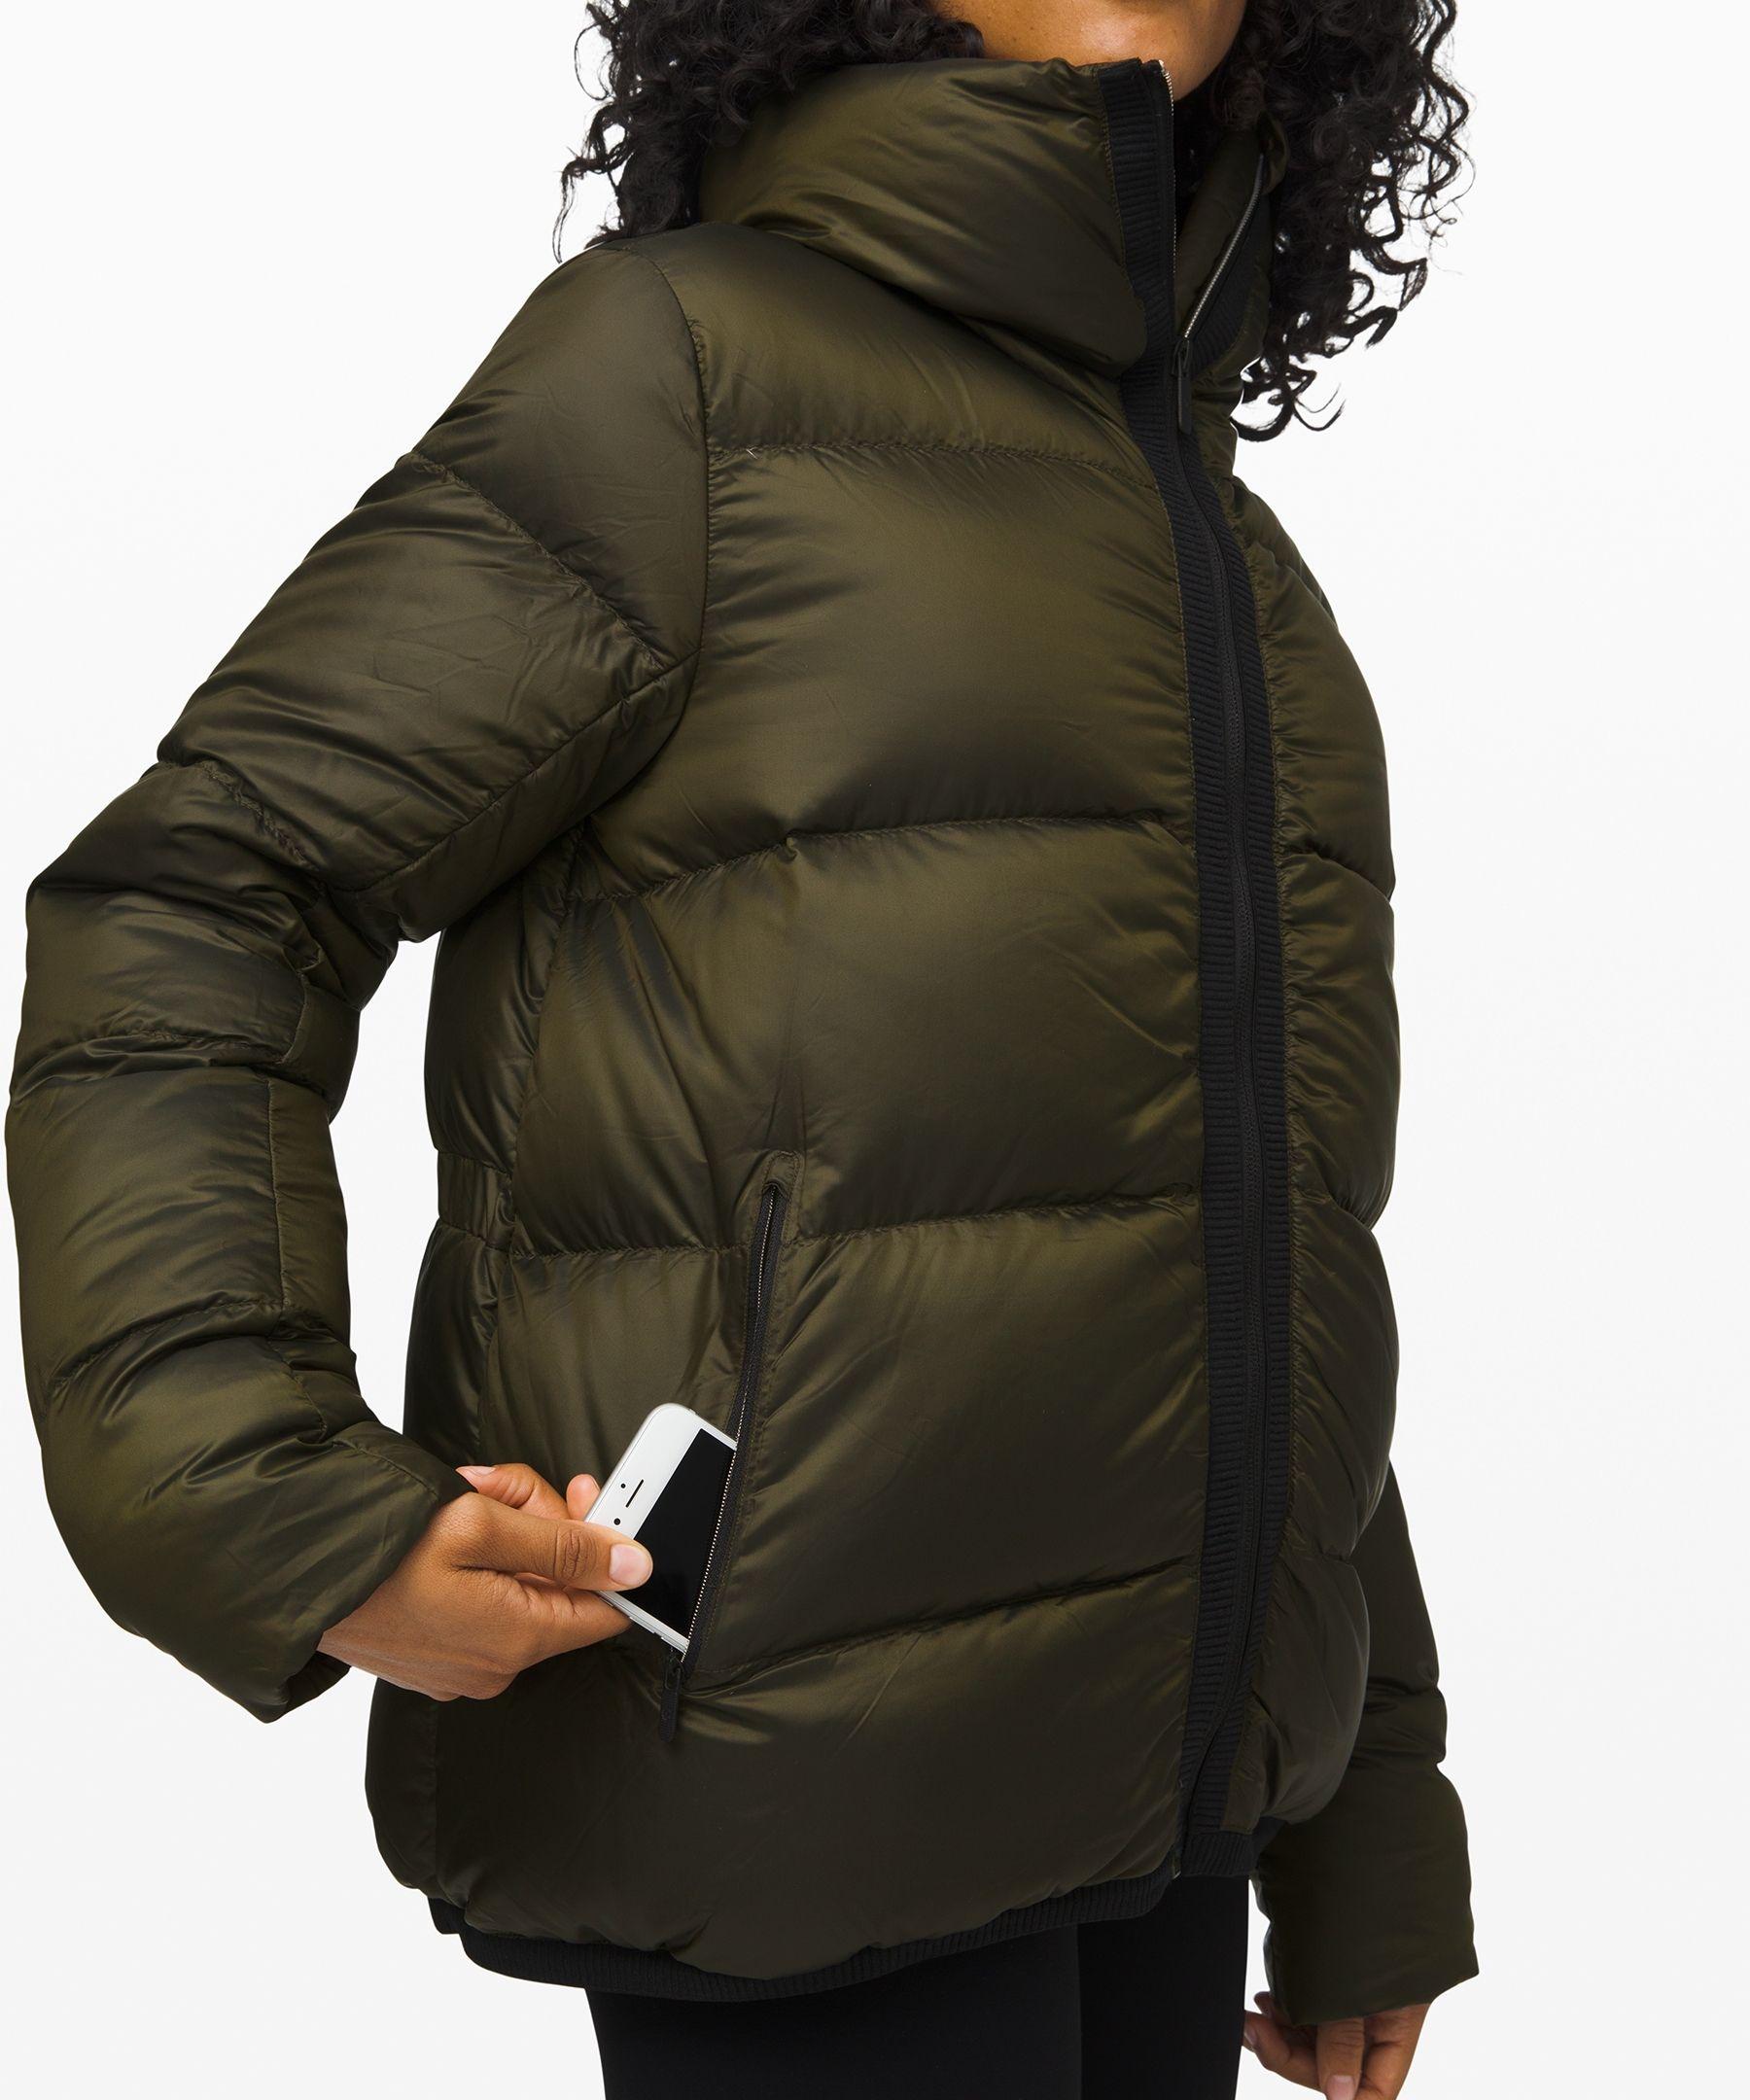 lululemon Cloudscape Jacket, Dark Olive, Size 8 in 2020